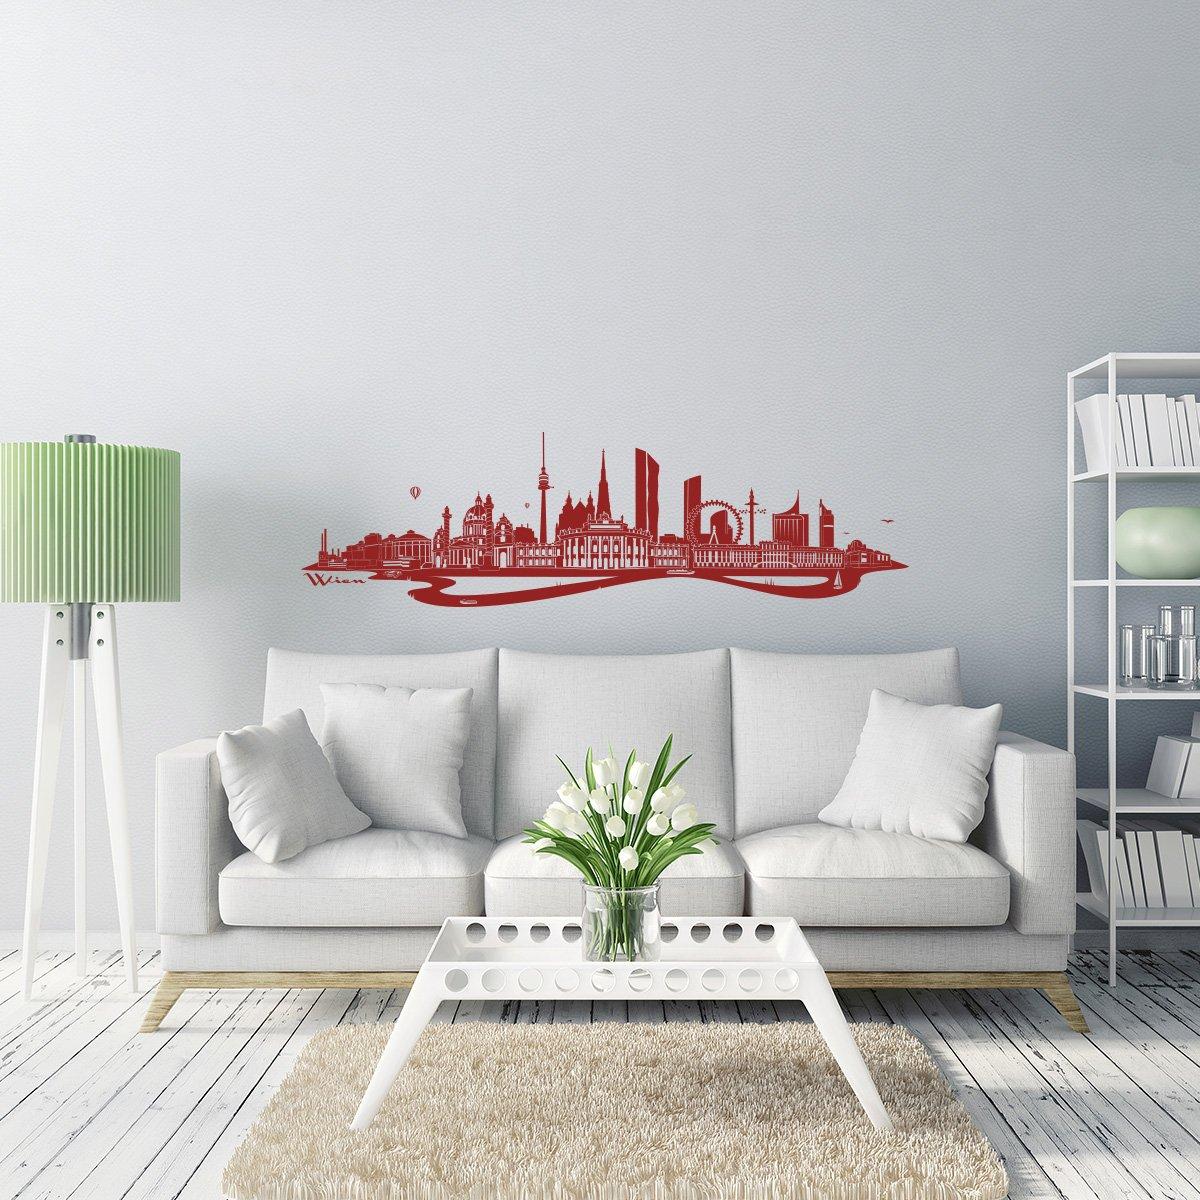 WANDKINGS Wandtattoo - Skyline Wien Wien Wien (mit Fluss) - 300 x 86 cm - Mittelgrau - Wähle aus 6 Größen & 35 Farben B078SHPHJS Wandtattoos & Wandbilder 79ee8a